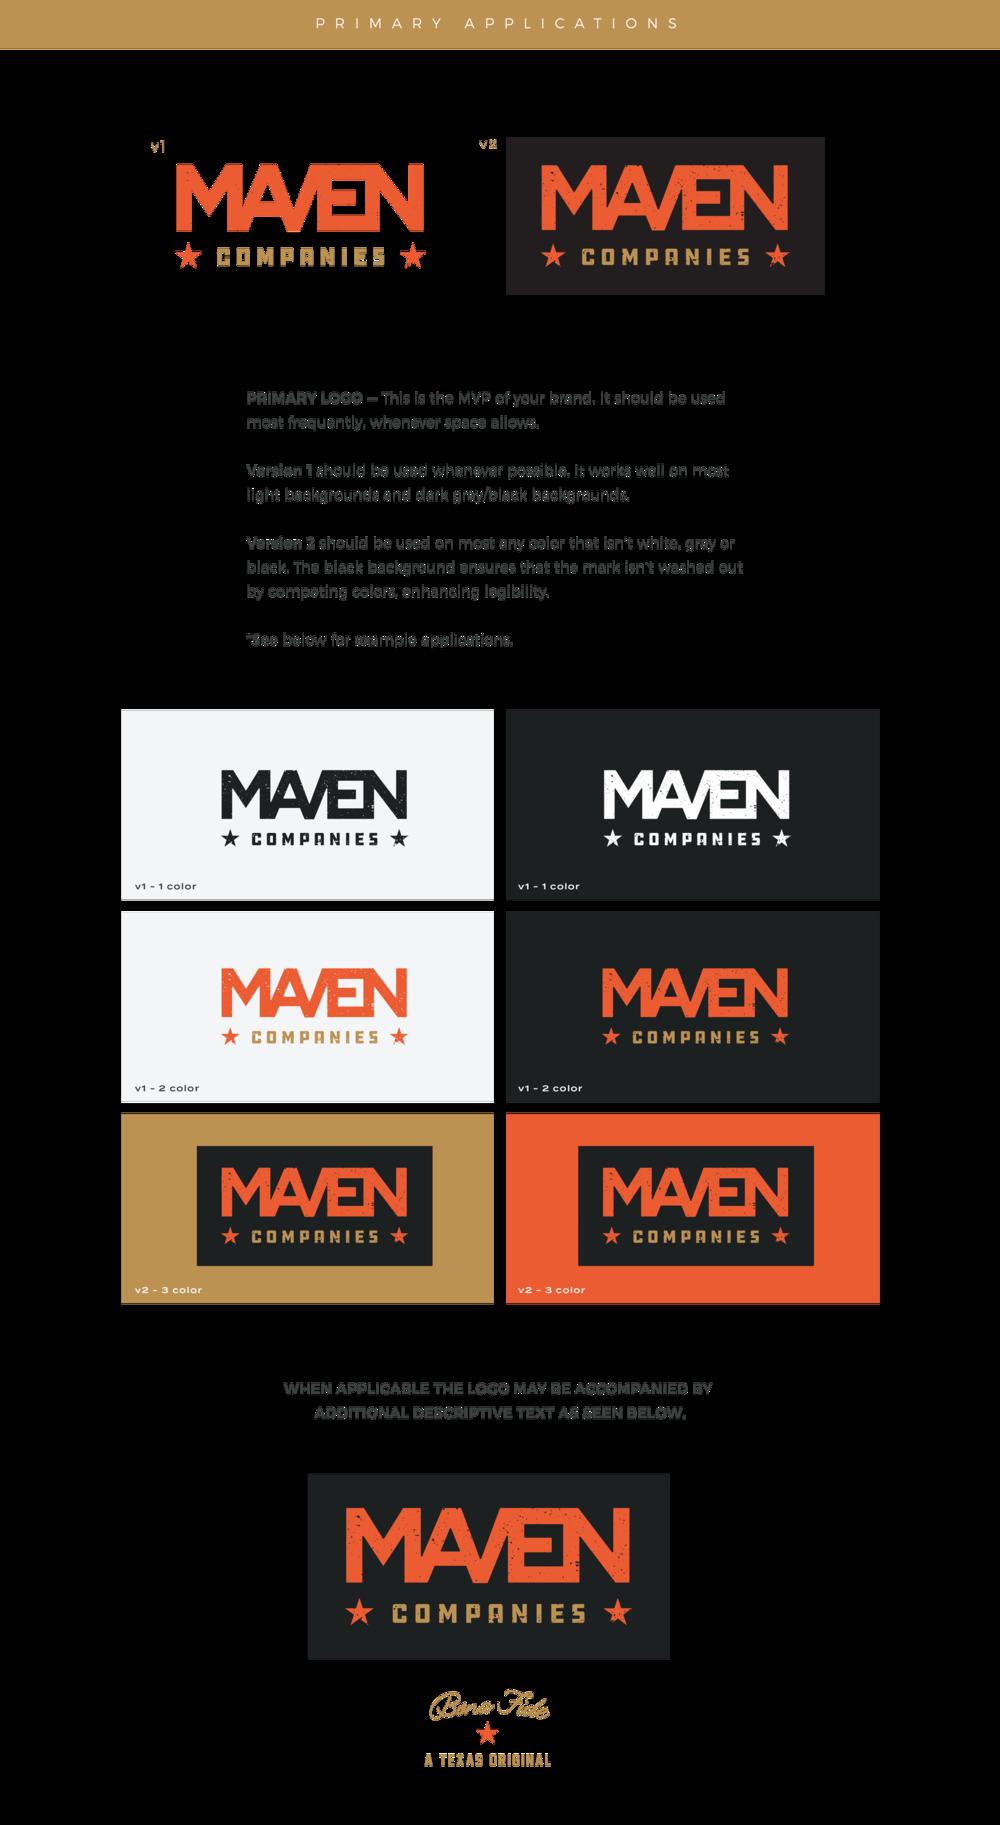 Maven-Style-Guide-4-12-18-v1_02.png